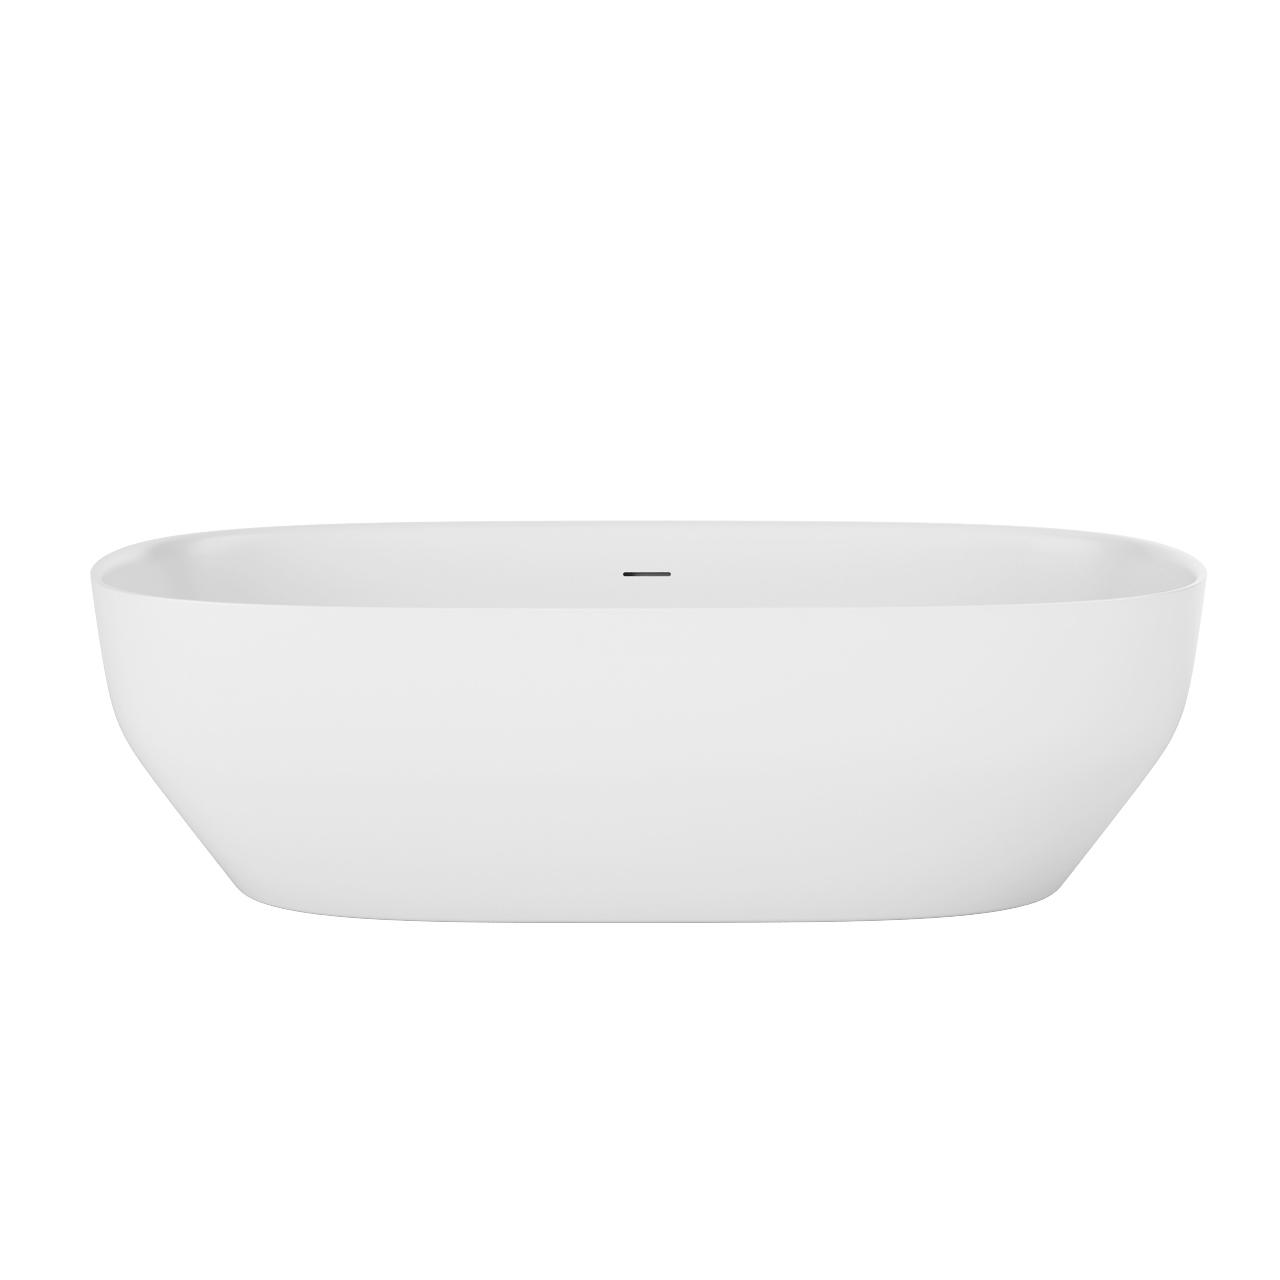 Ago Bathtub 175 x 80 by antoniolupi